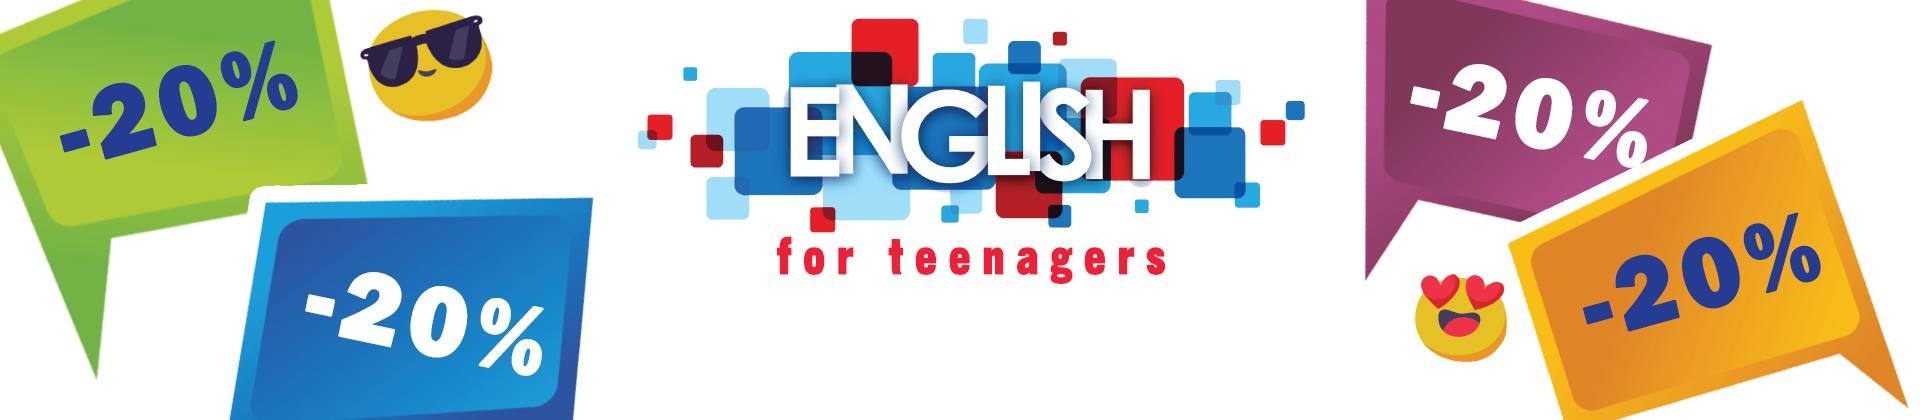 english for teenagers